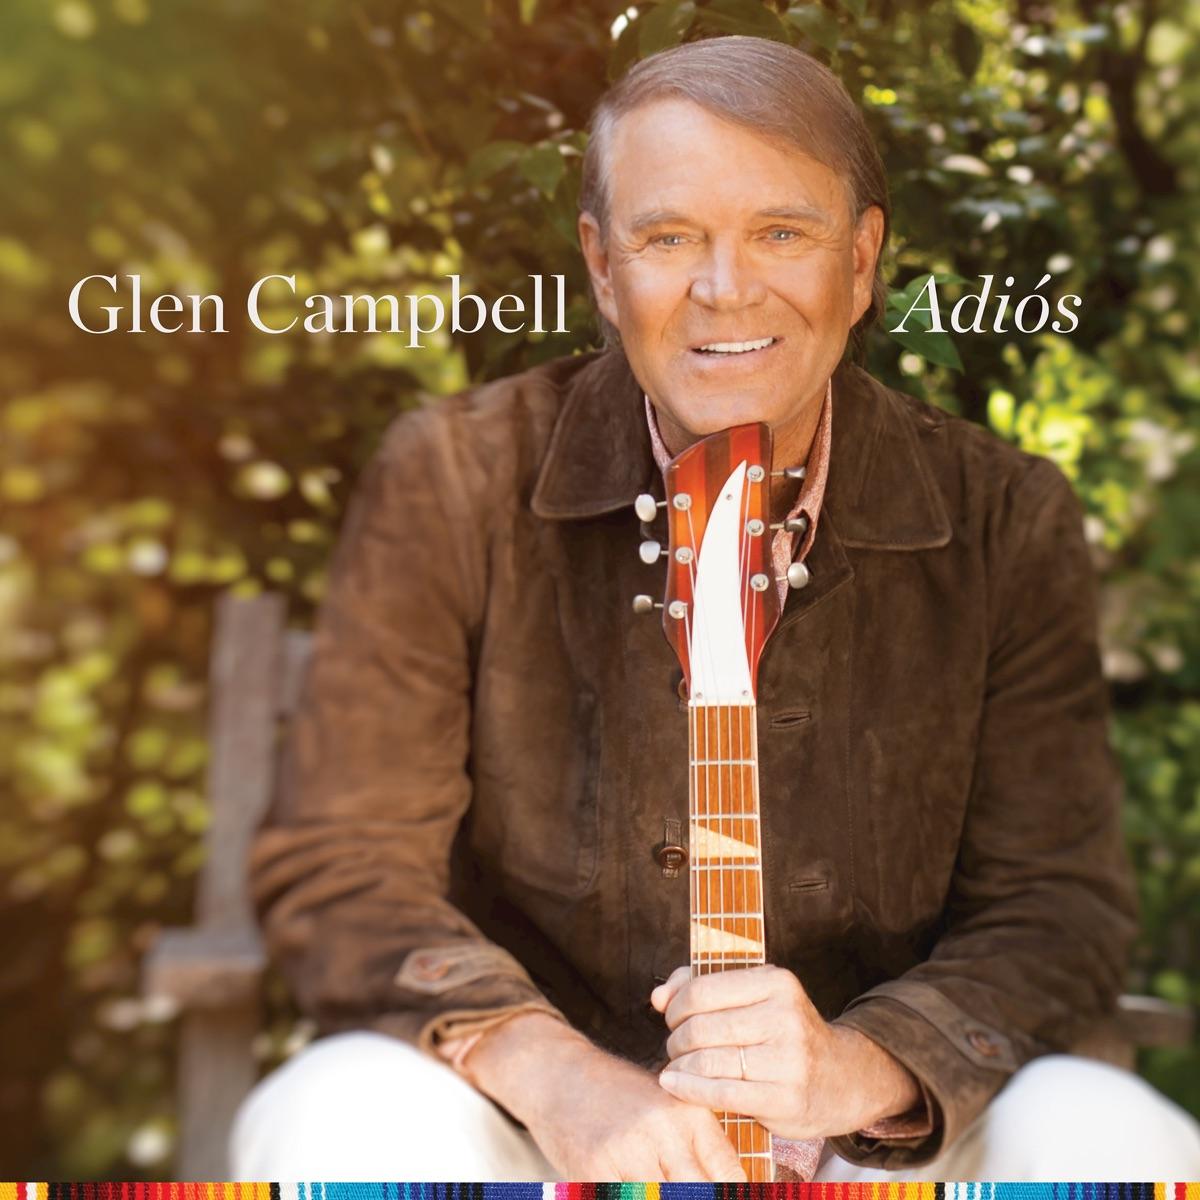 Adiós Glen Campbell CD cover